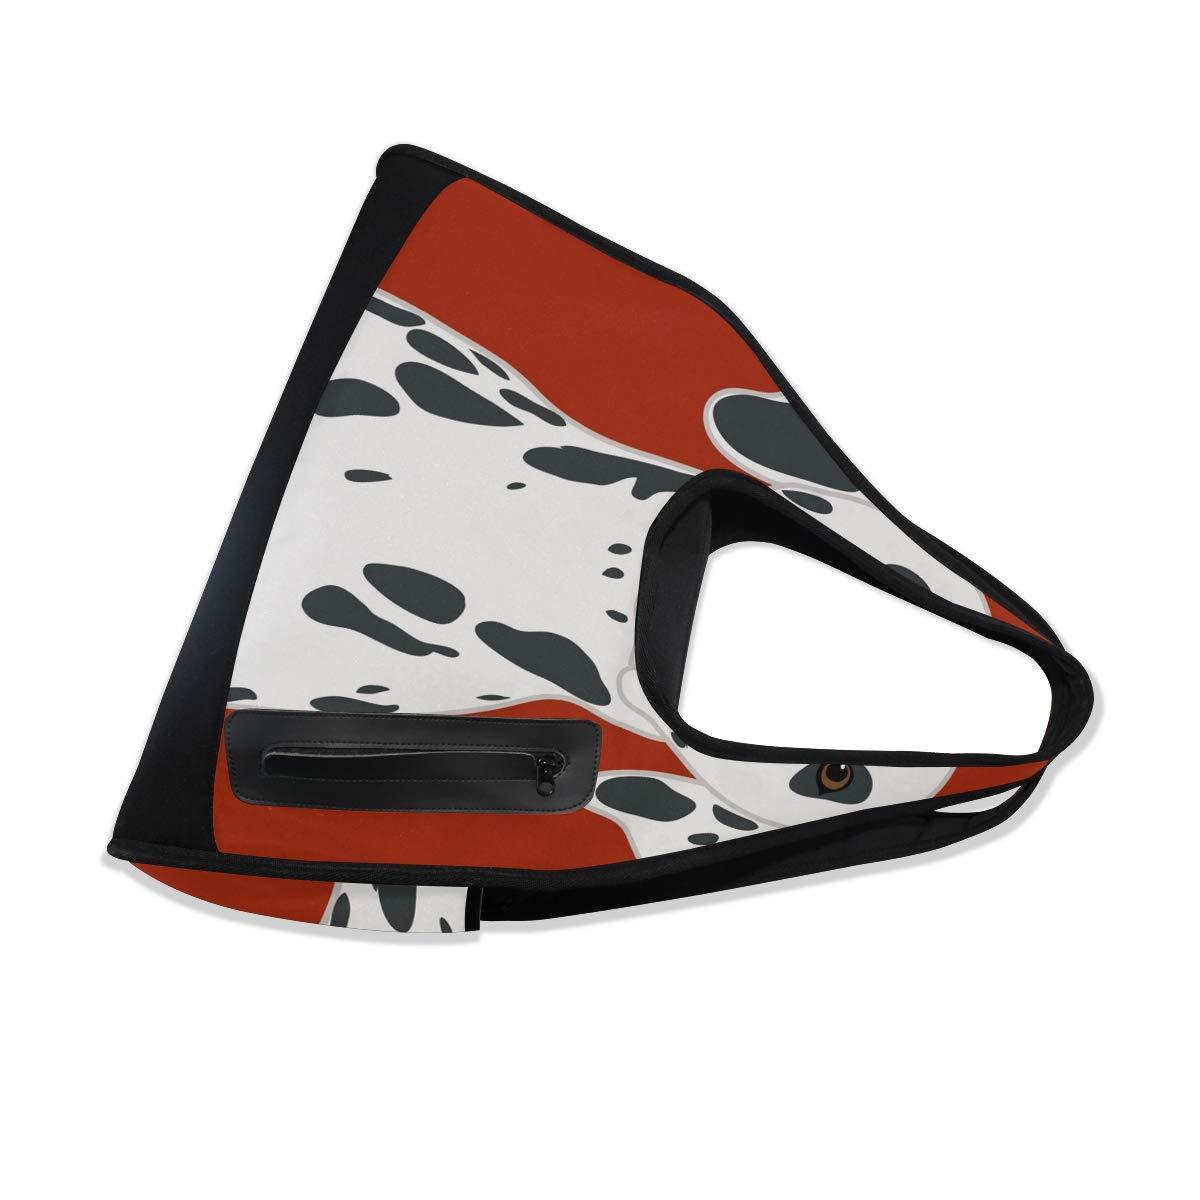 Animal Dalmatian Dog Women Sports Gym Totes Bag Multi-Function Nylon Travel Shoulder Bag